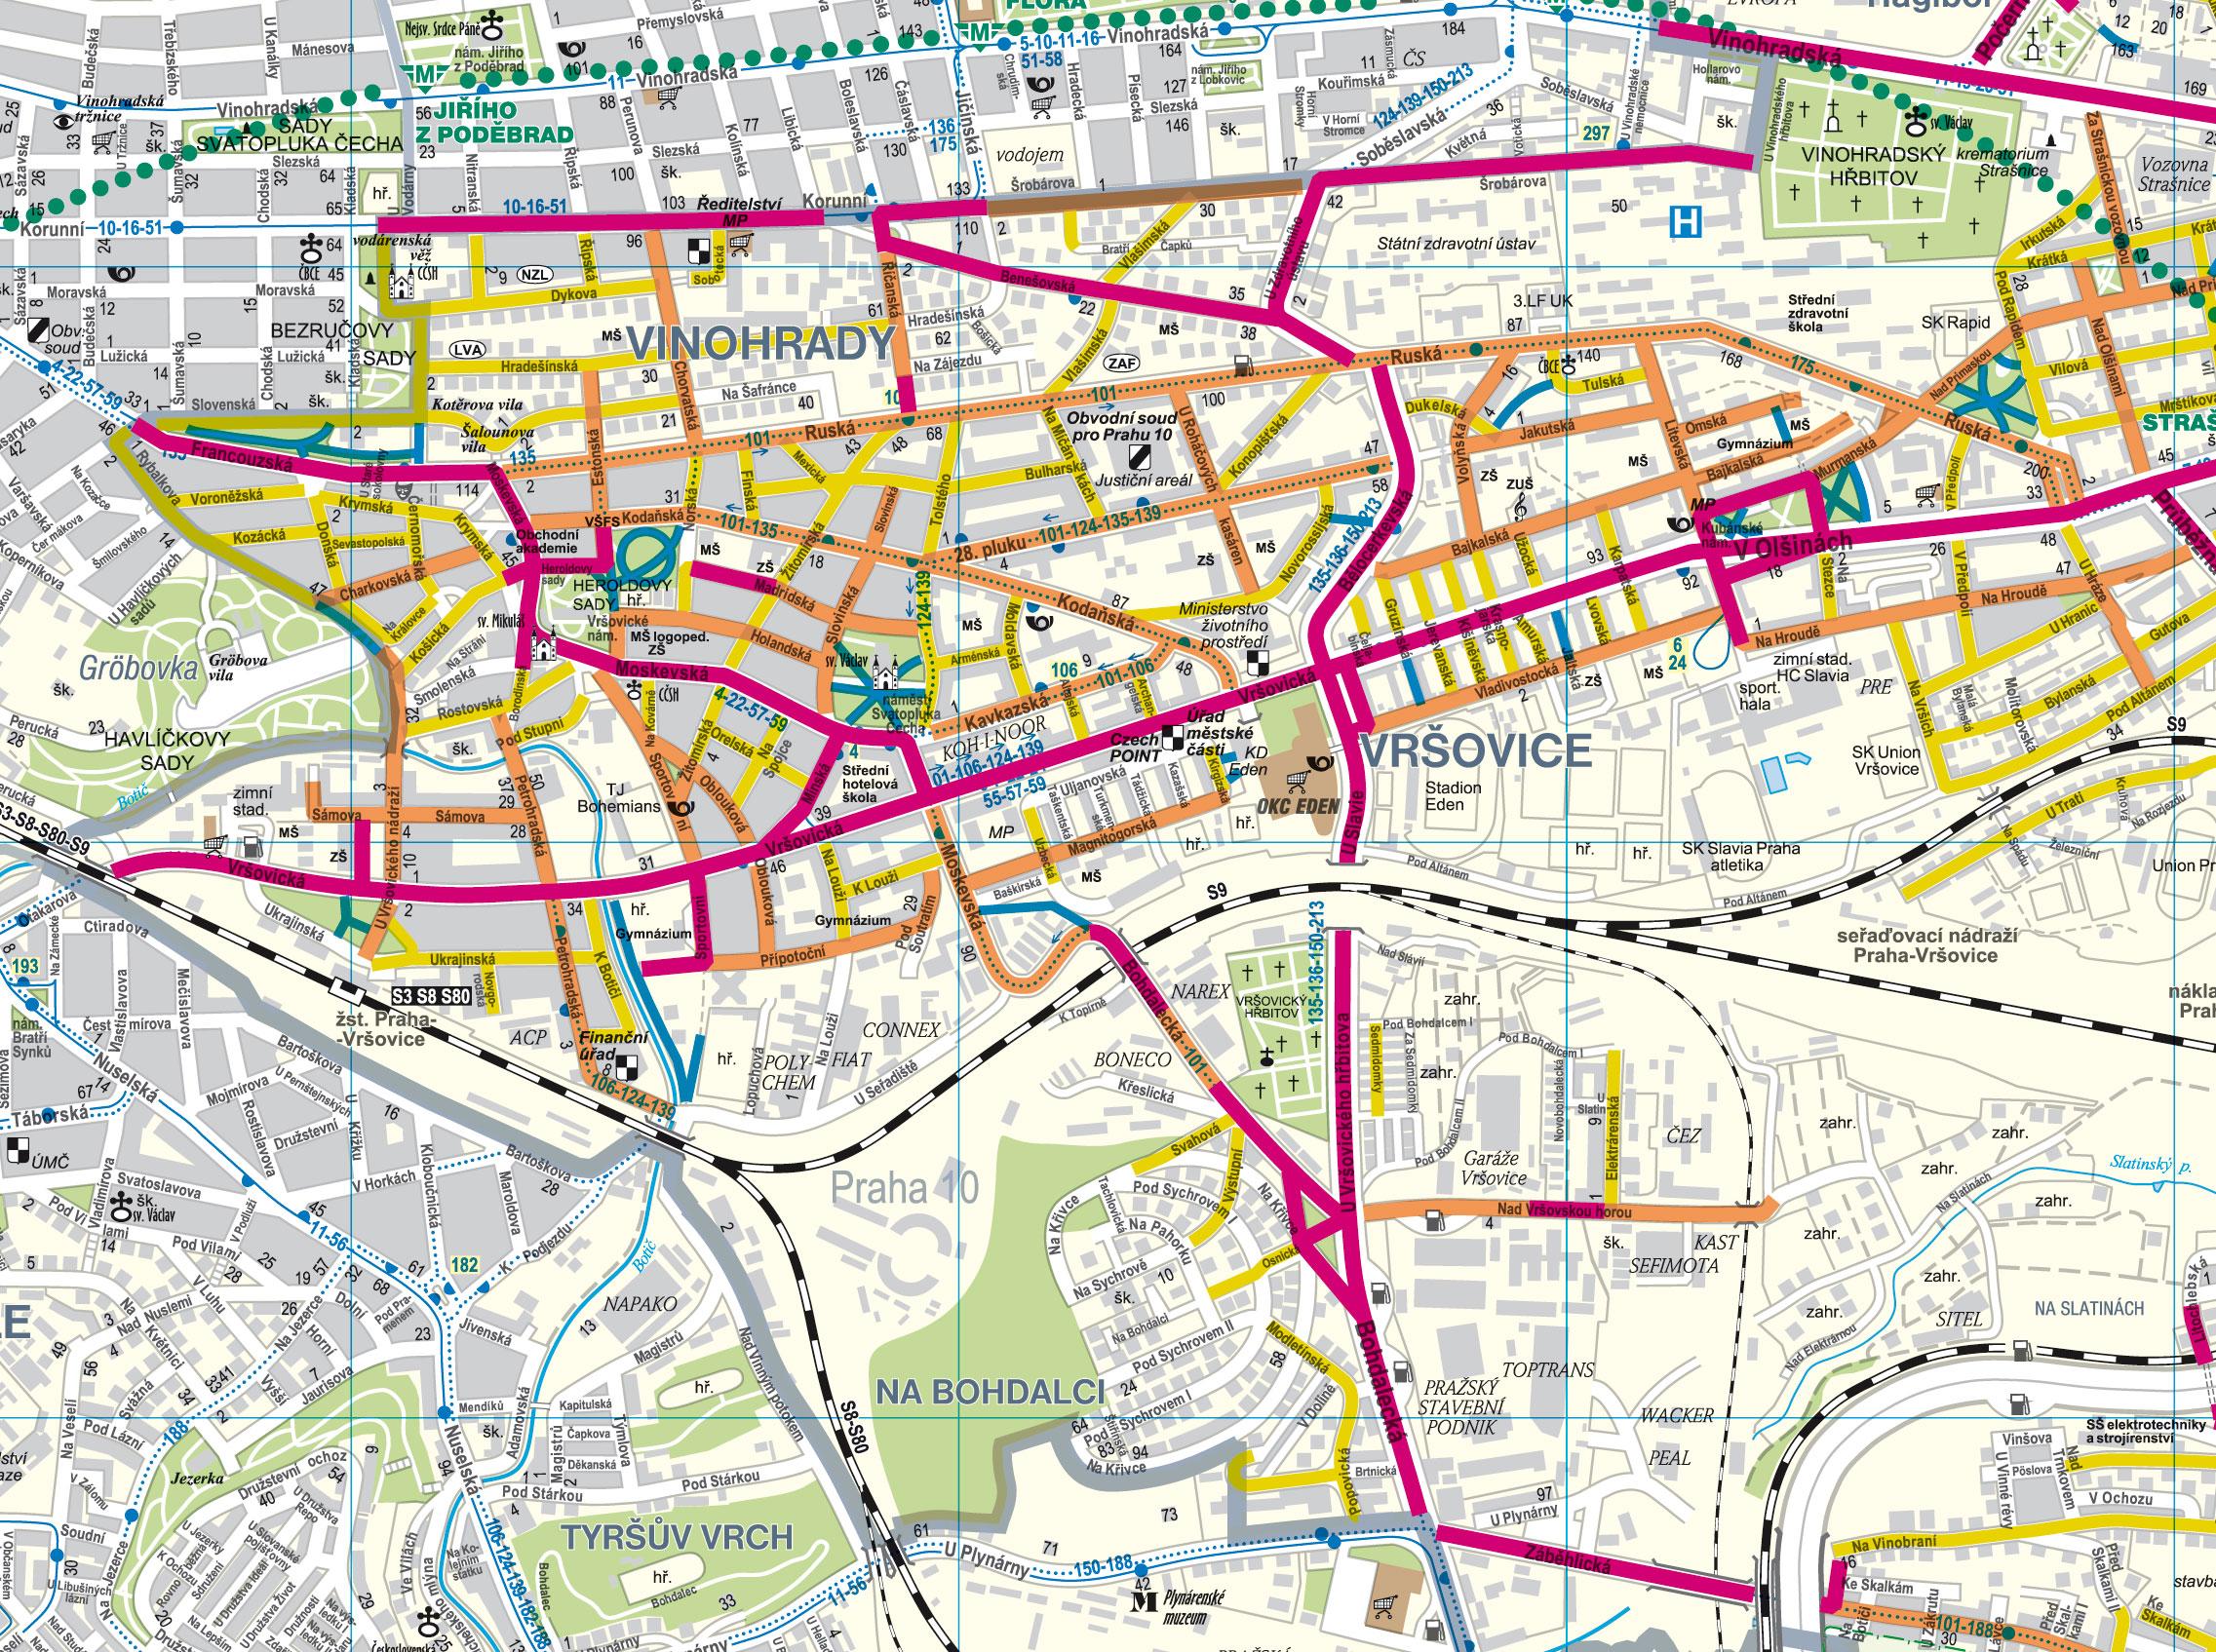 Mapy Zimniho Uklidu Chodniku V Praze 10 Mestska Cast Praha 10